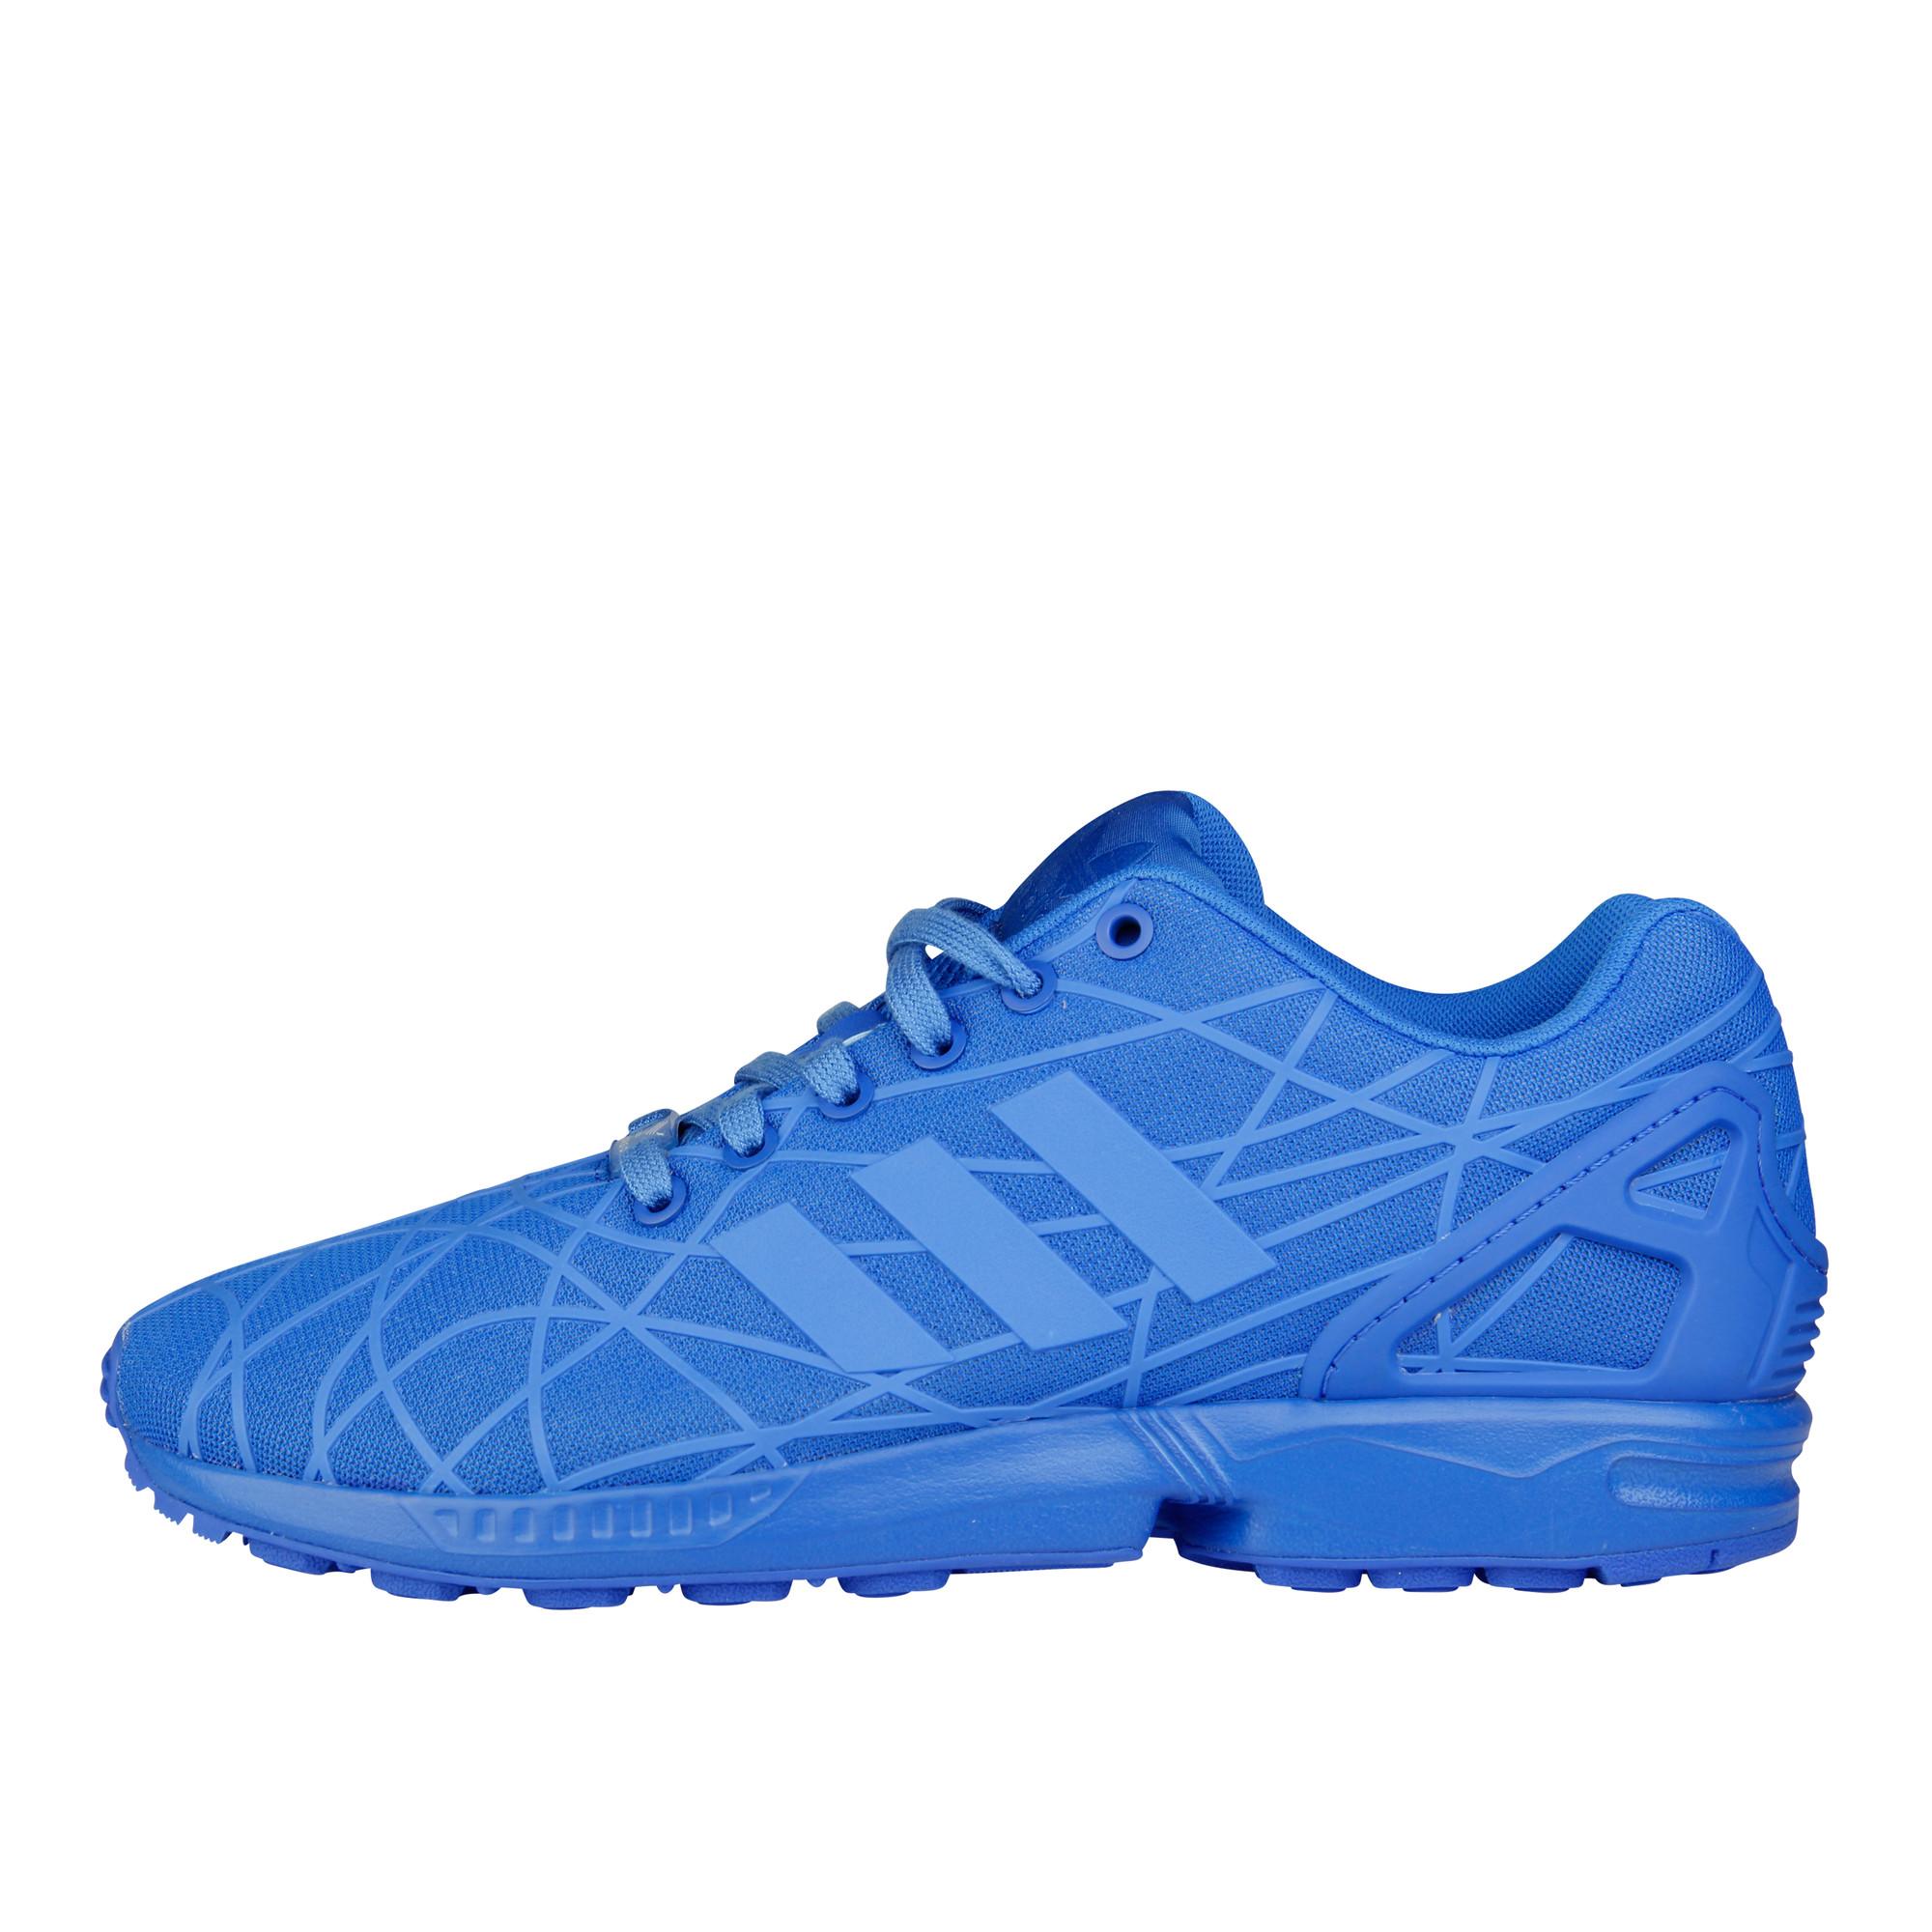 RS106243_Foot Locker x It Must Be February_adidas ZX Flux Blue-lpr